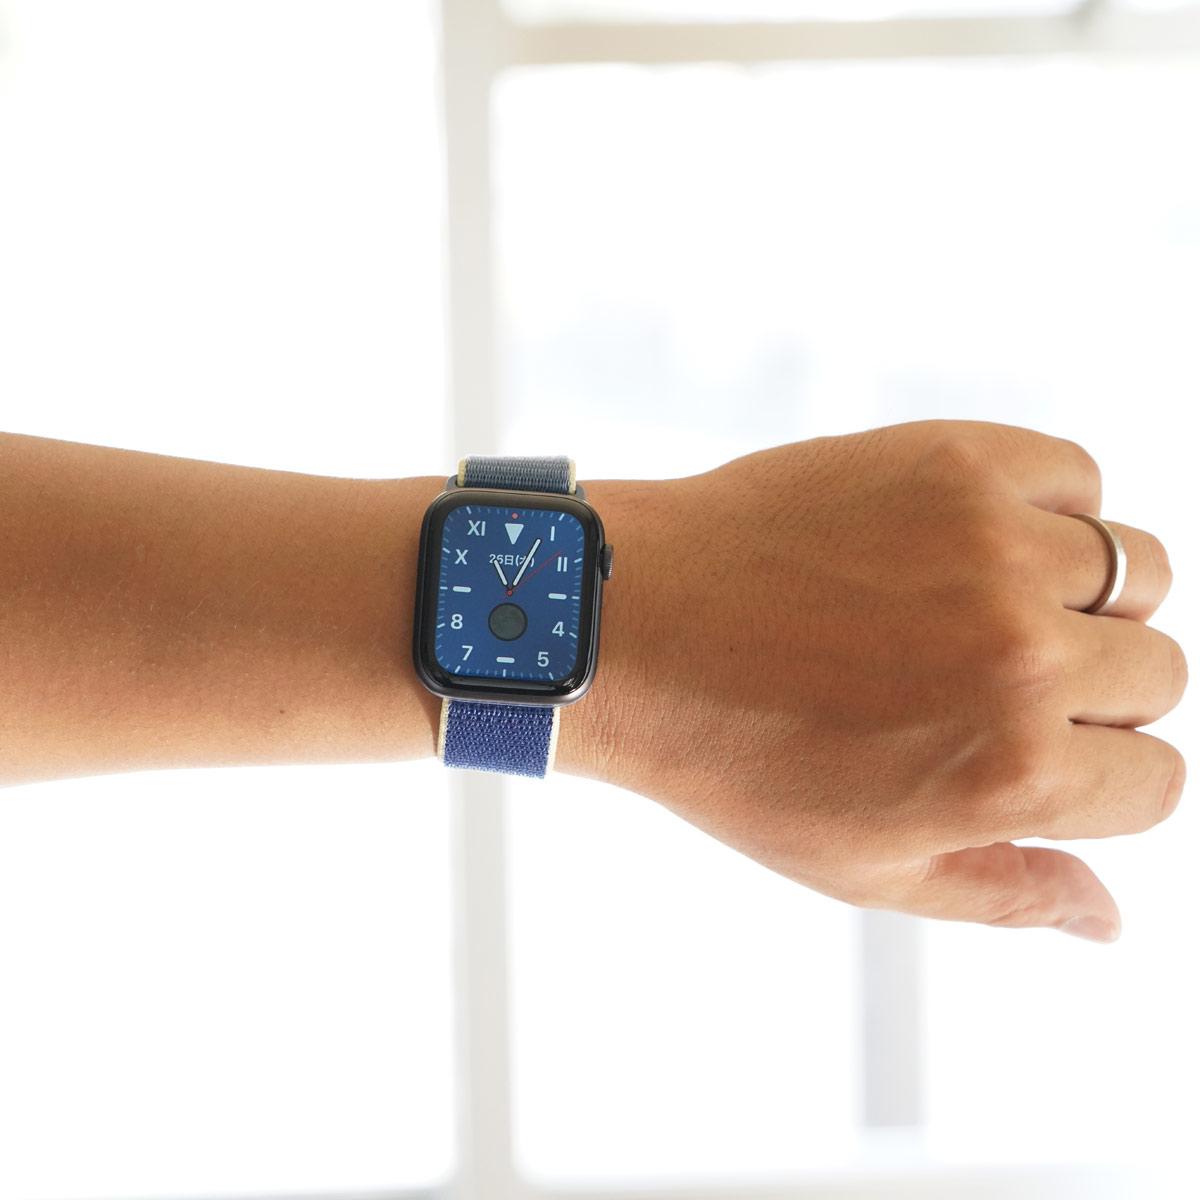 「Apple Watch Series 5」レビュー。「常時表示」は一見地味だが大きな一歩の予感